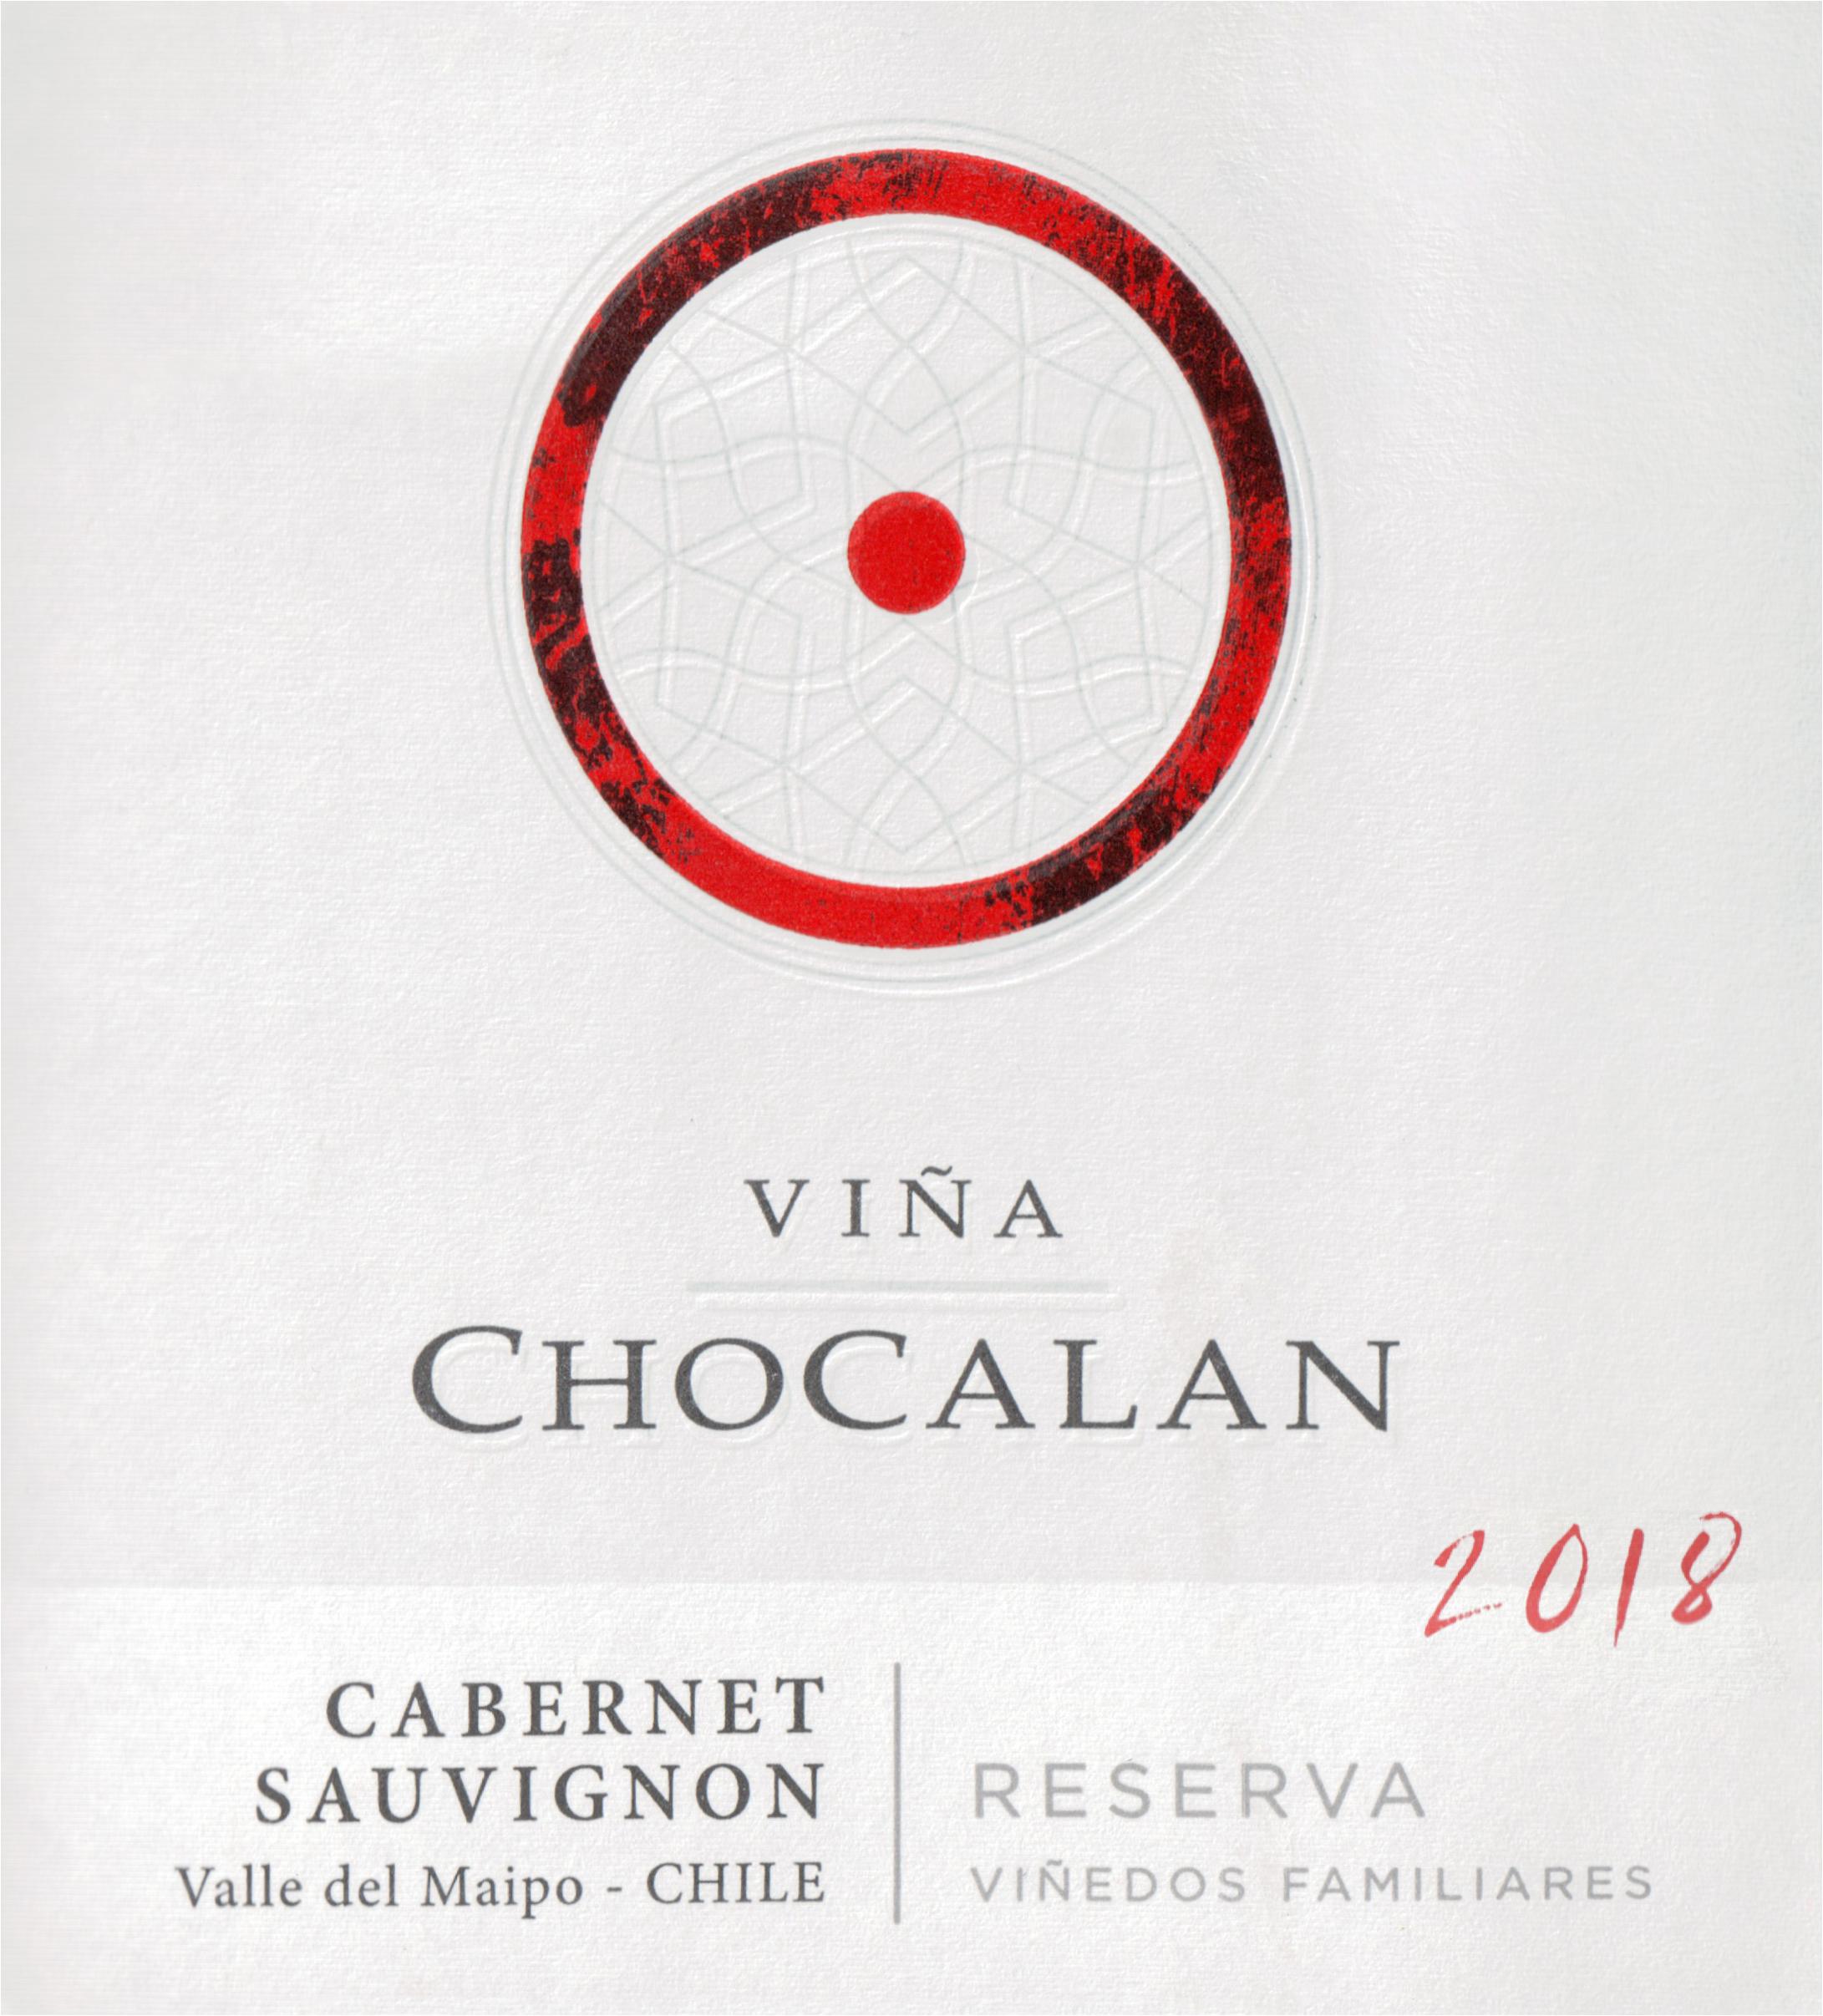 Vina Chocalan Reserva Cabernet Sauvignon 2018